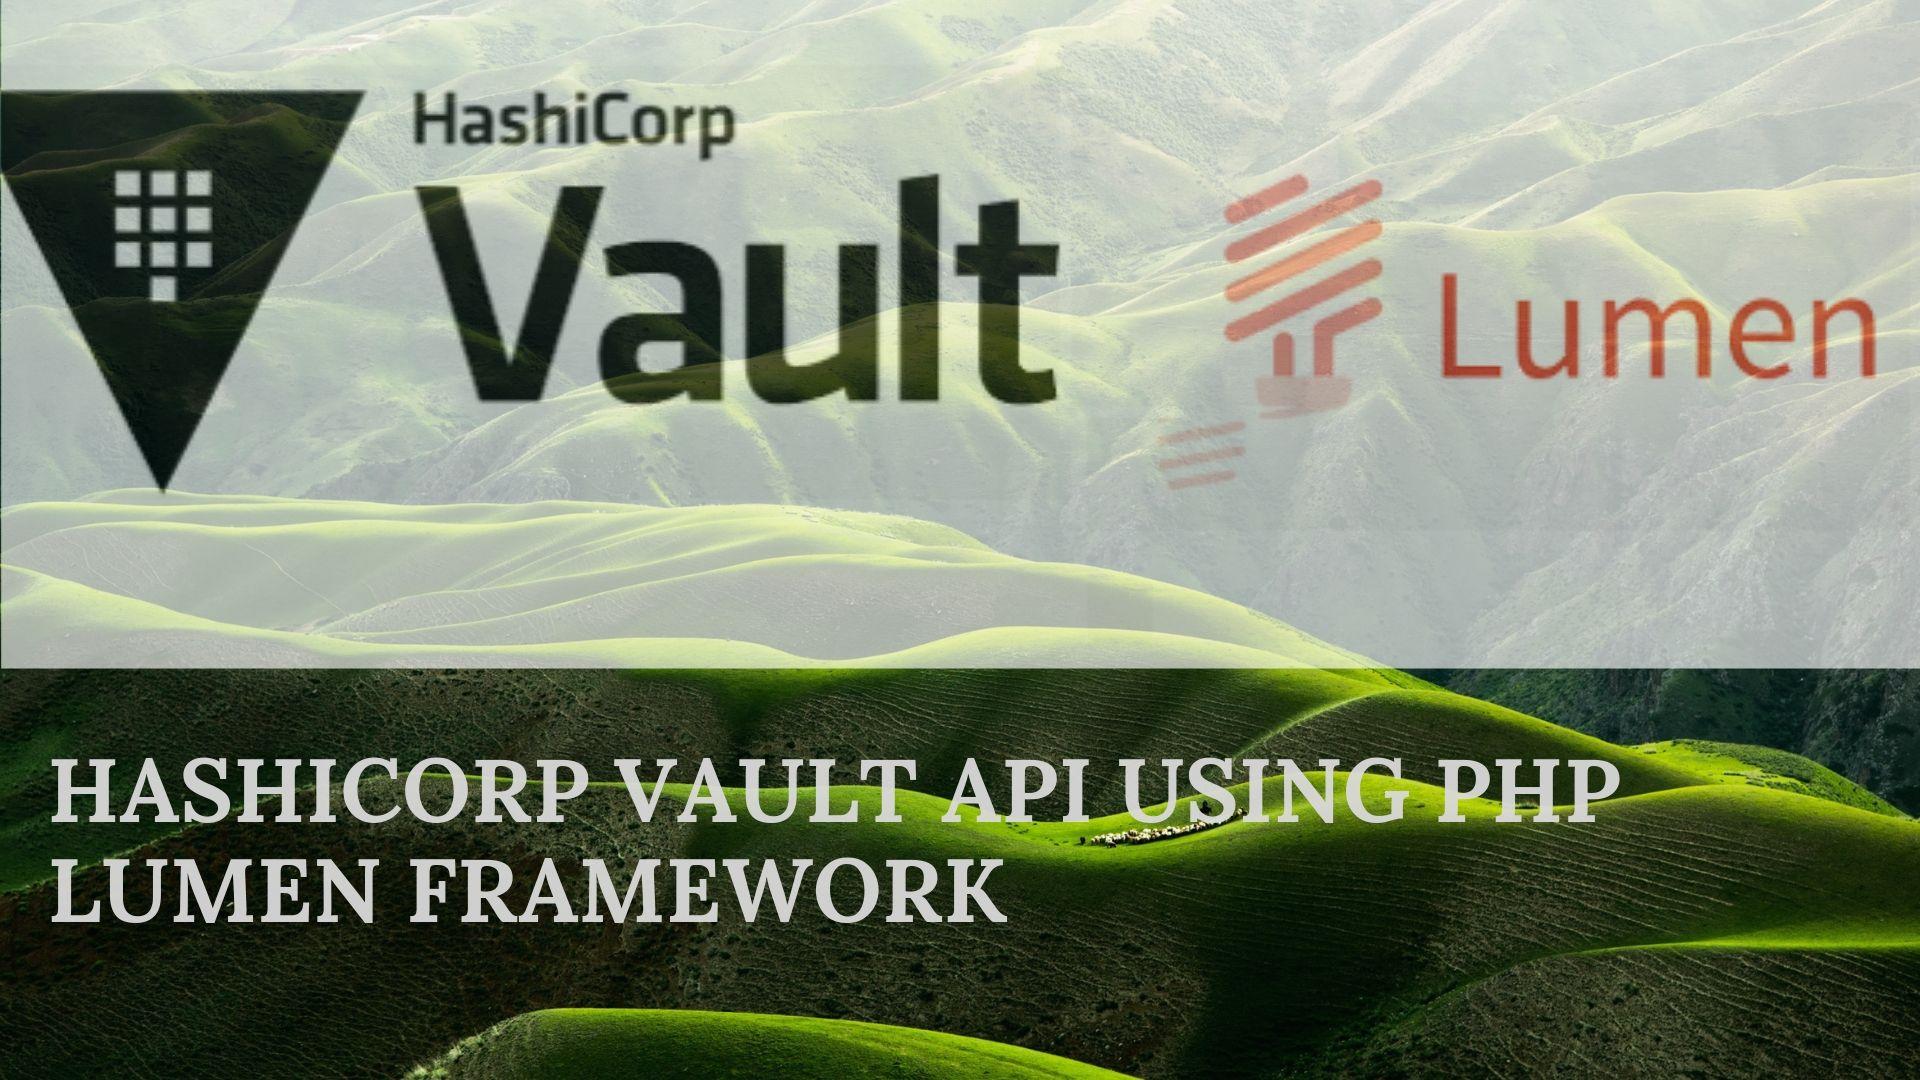 How To Consume HashiCorp Vault API Using Lumen